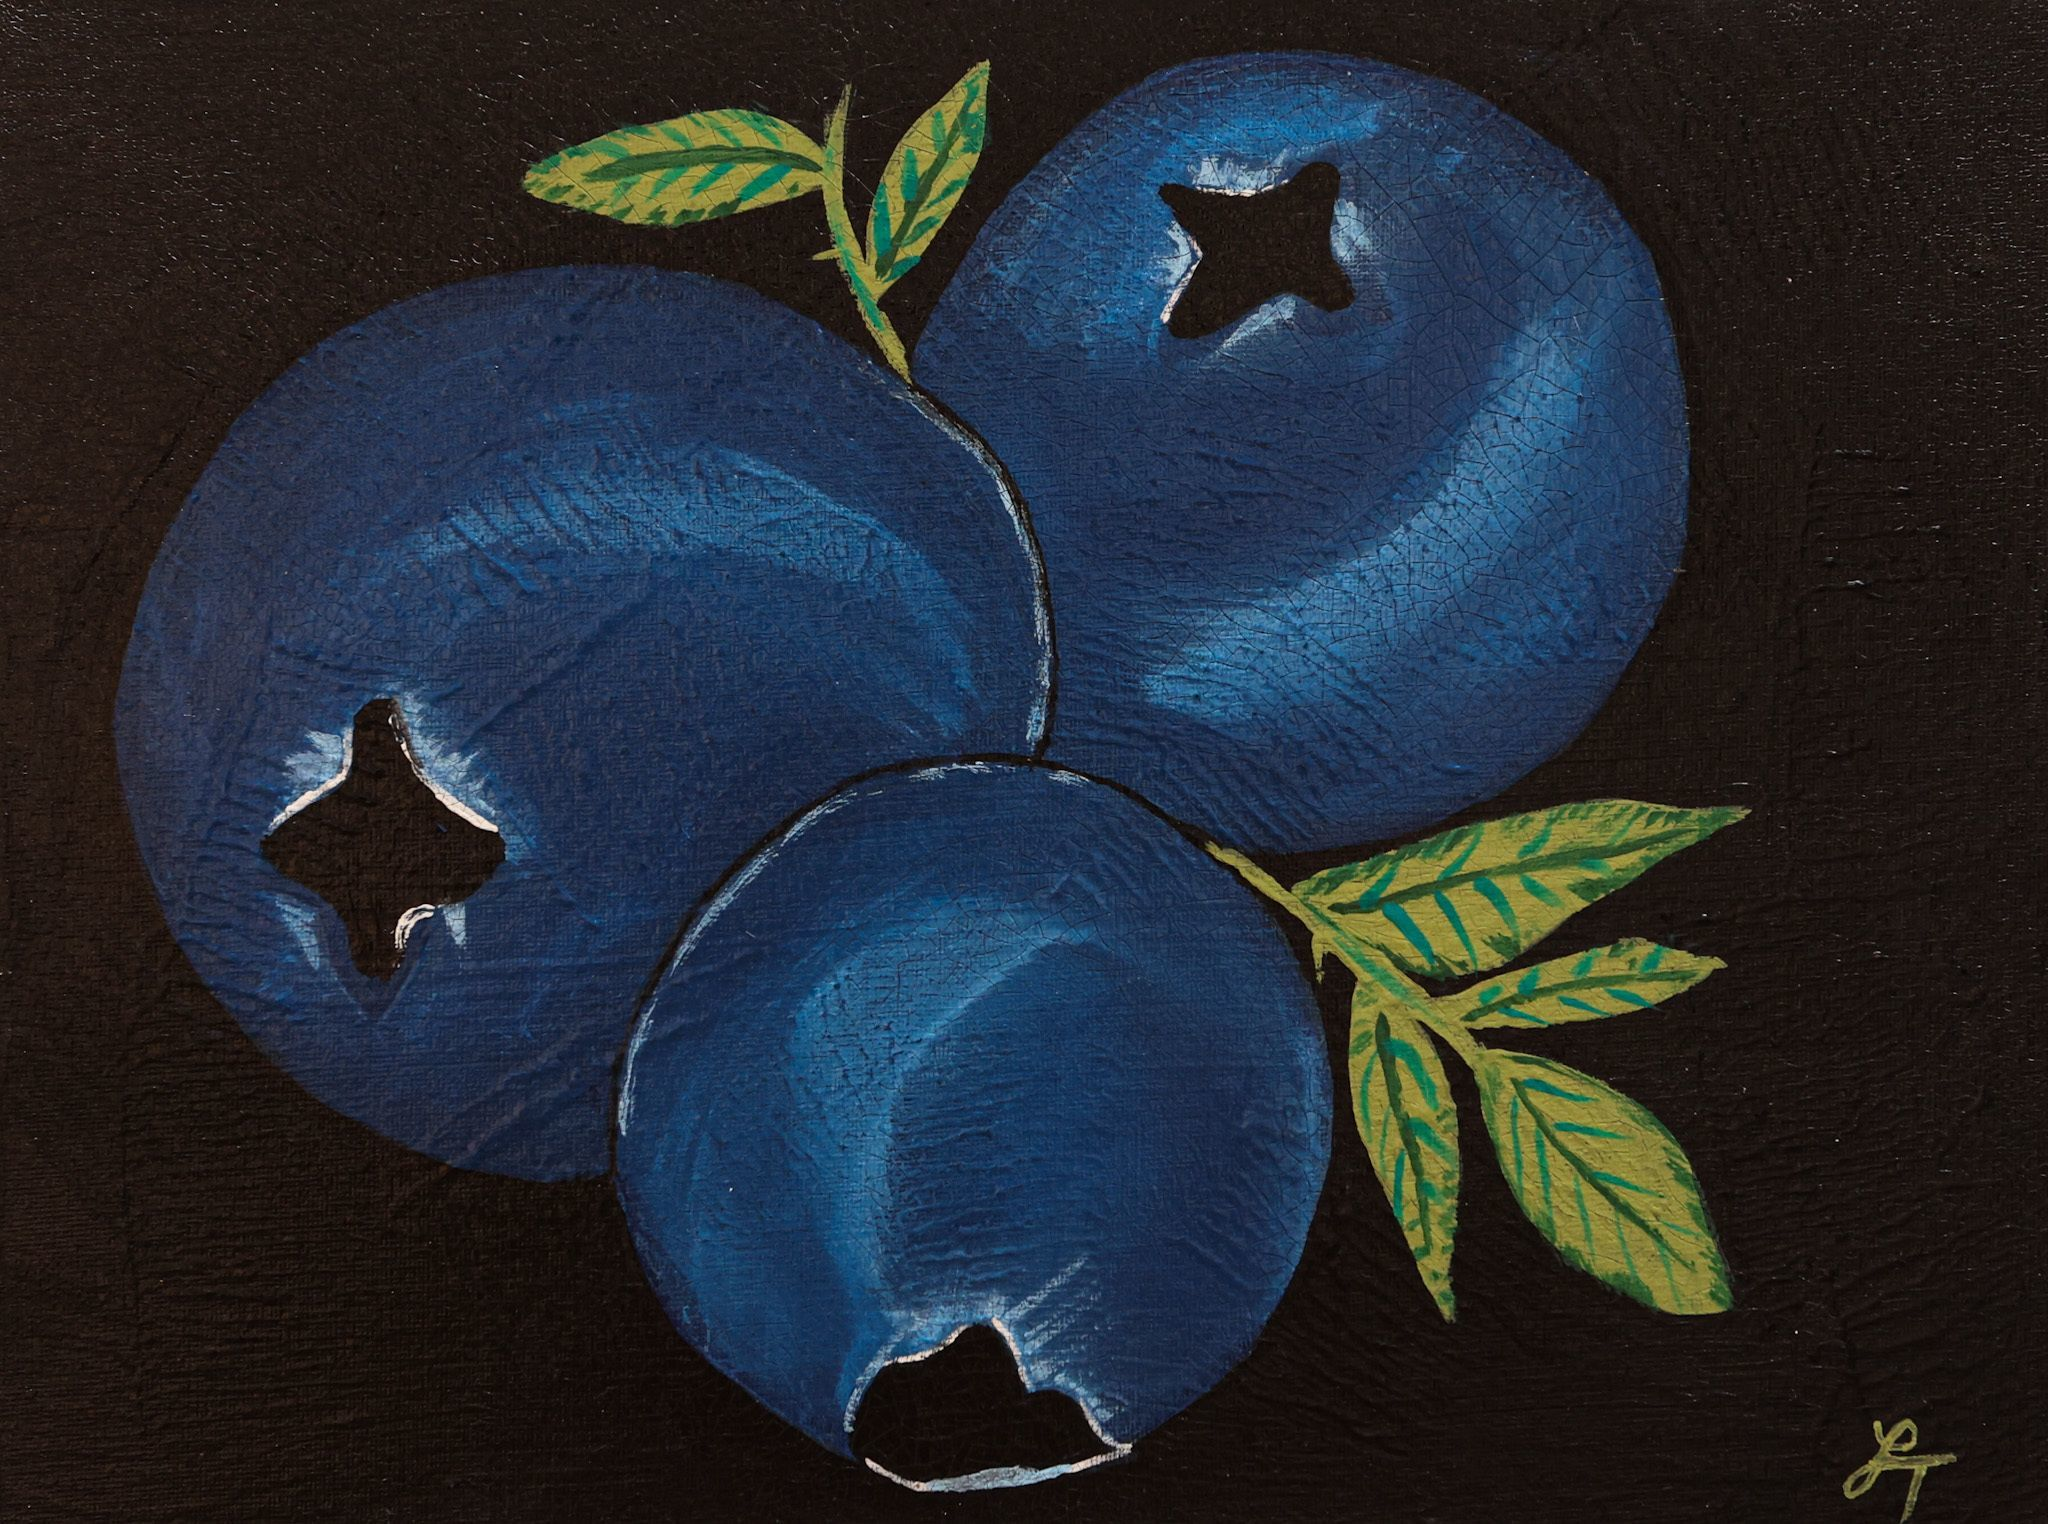 """Blueberries"" - Lesly Trelfa"